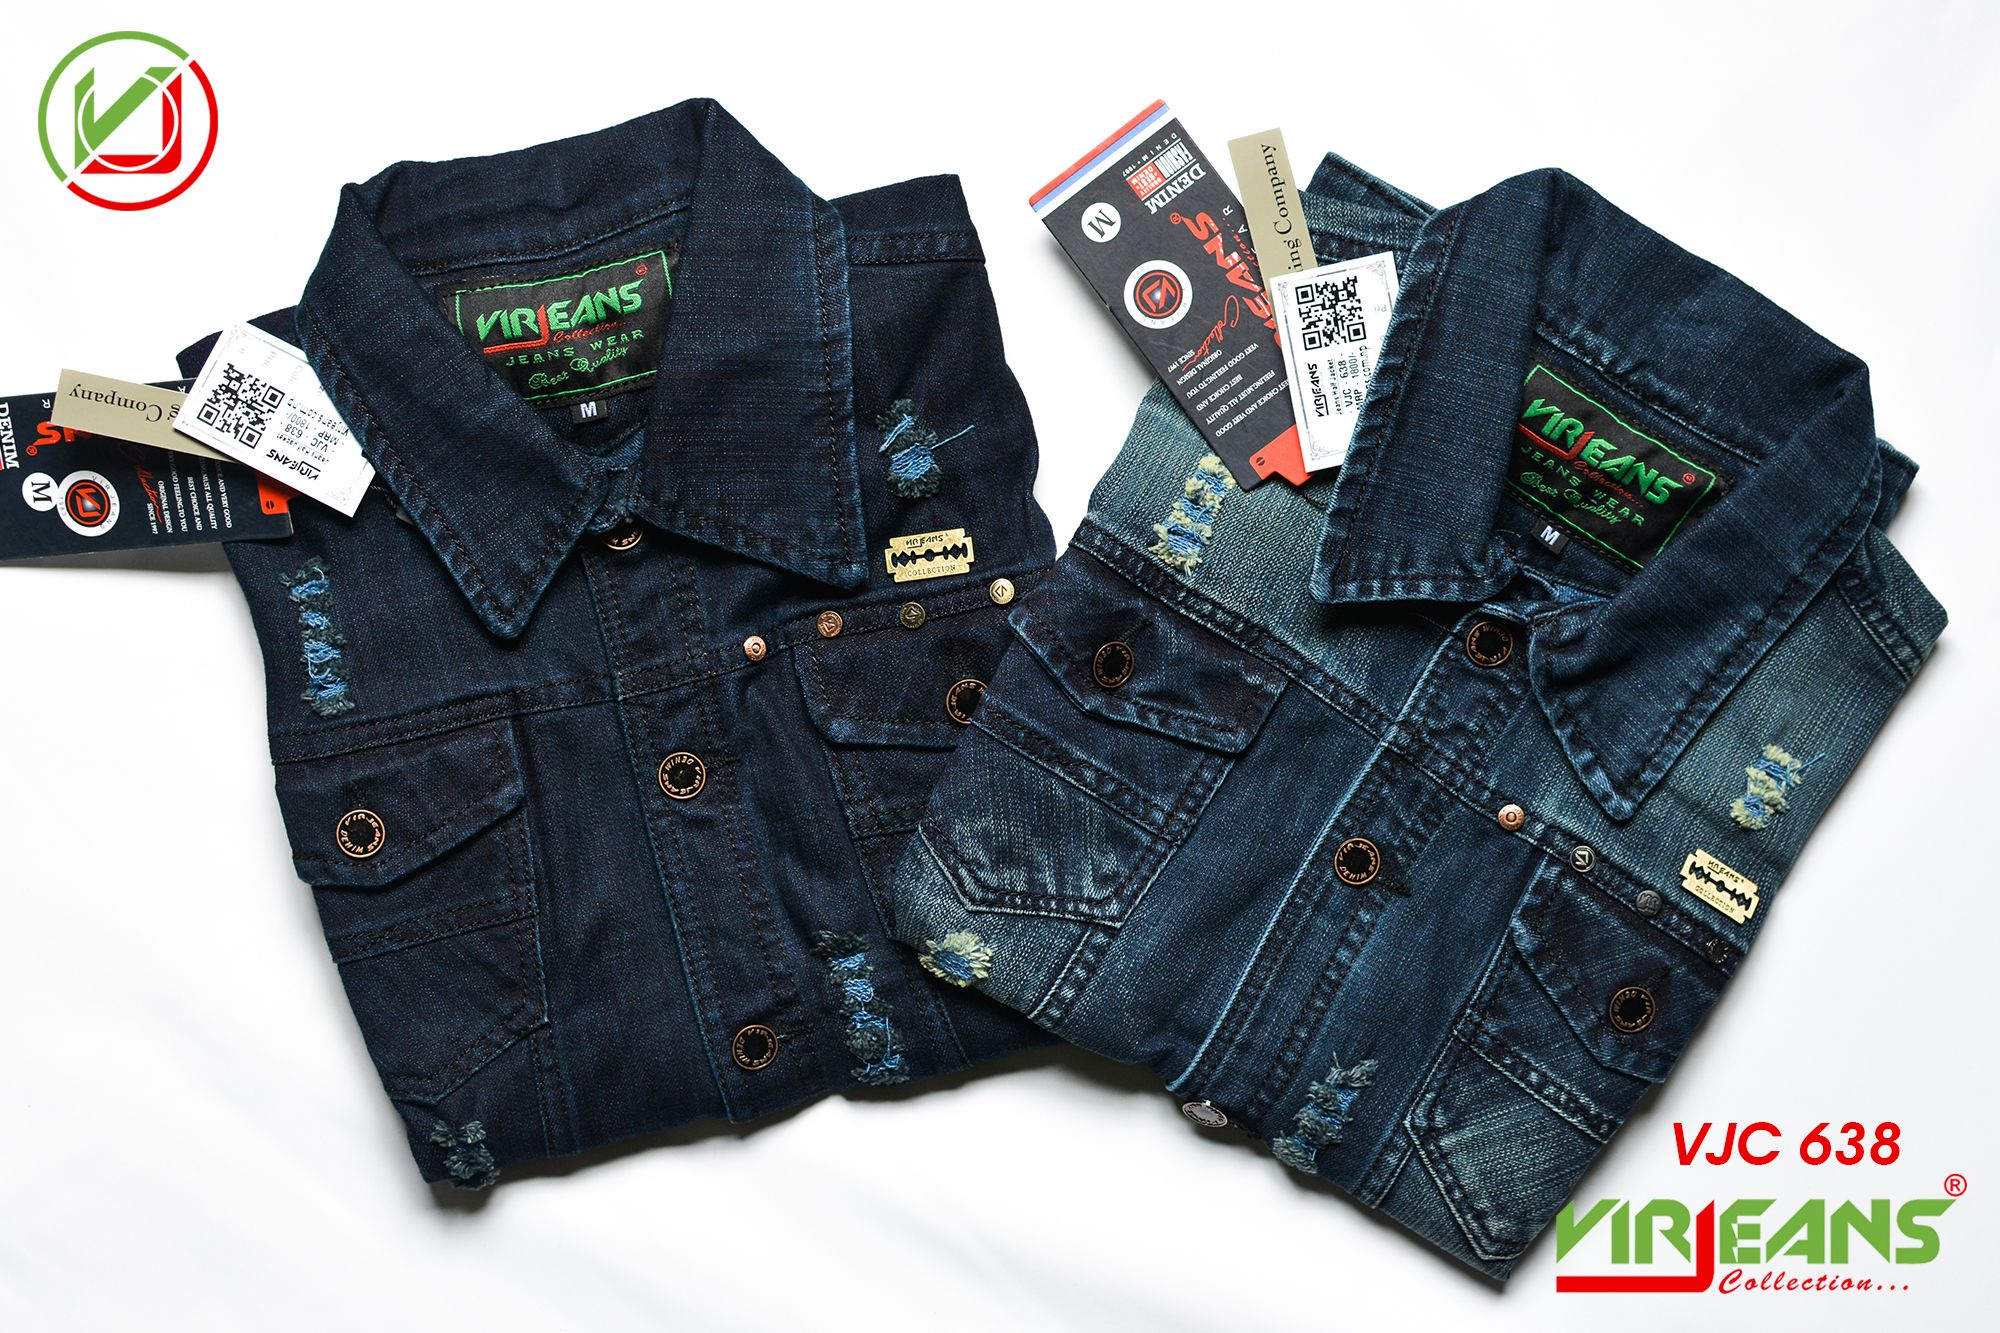 Fashion Wear Denim Jacket In Nepal Virjeans Clothing Brand Of